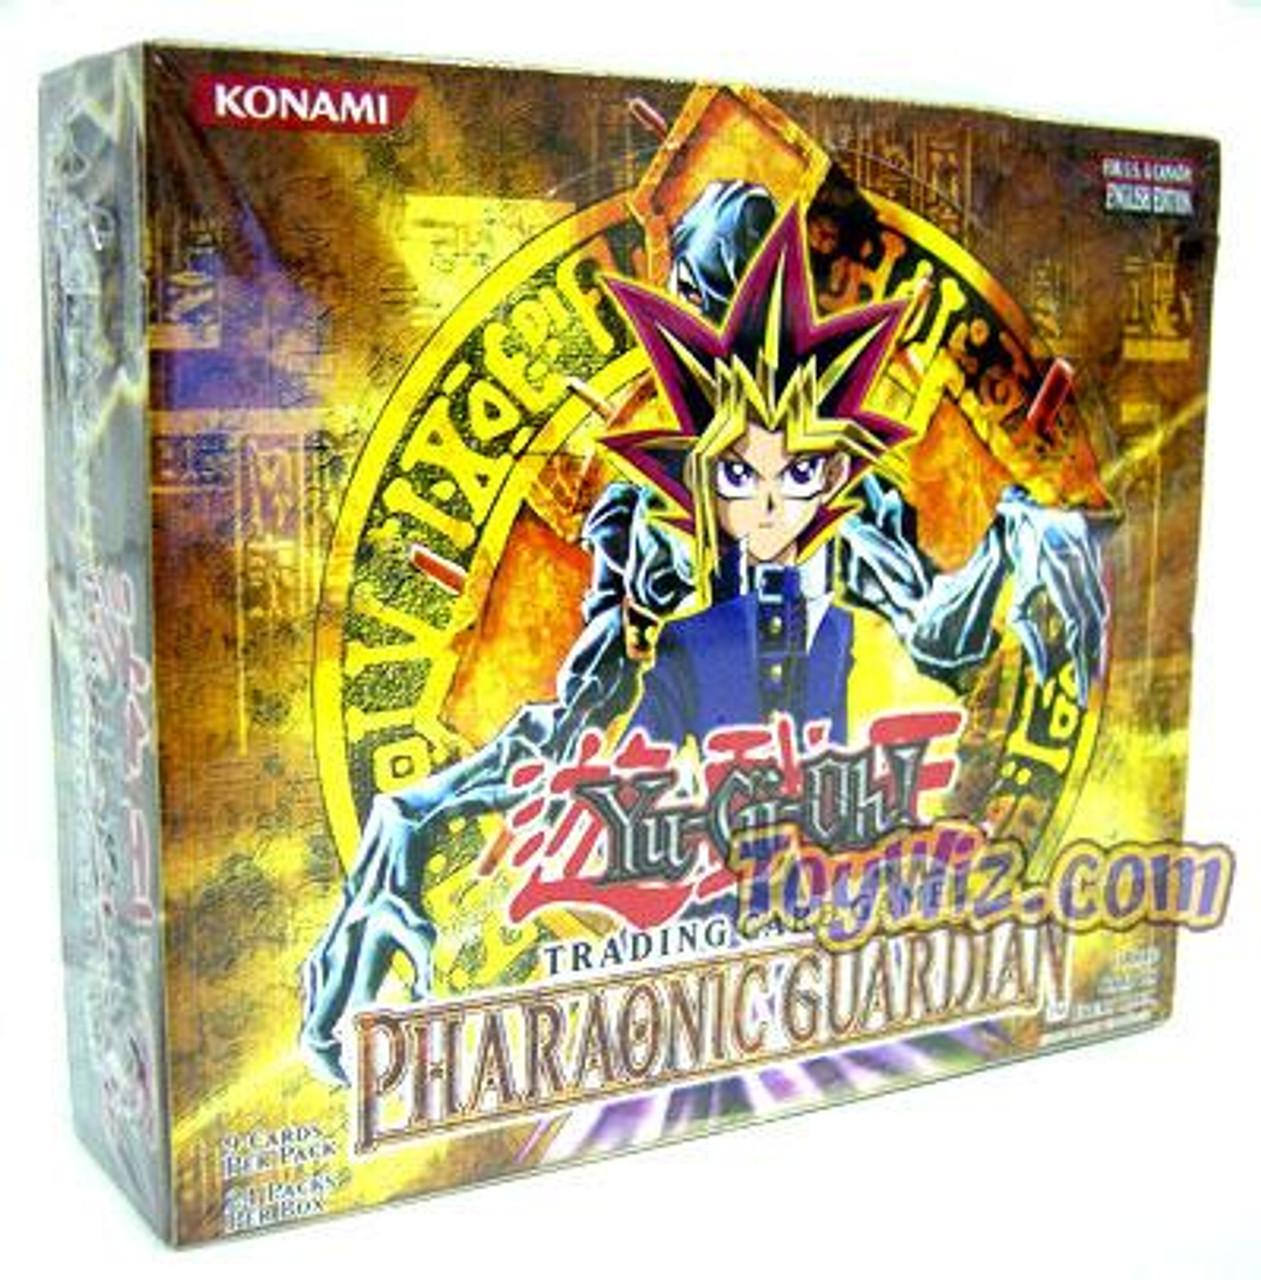 YuGiOh Pharaonic Guardian Booster Box [24 Packs] [Sealed]